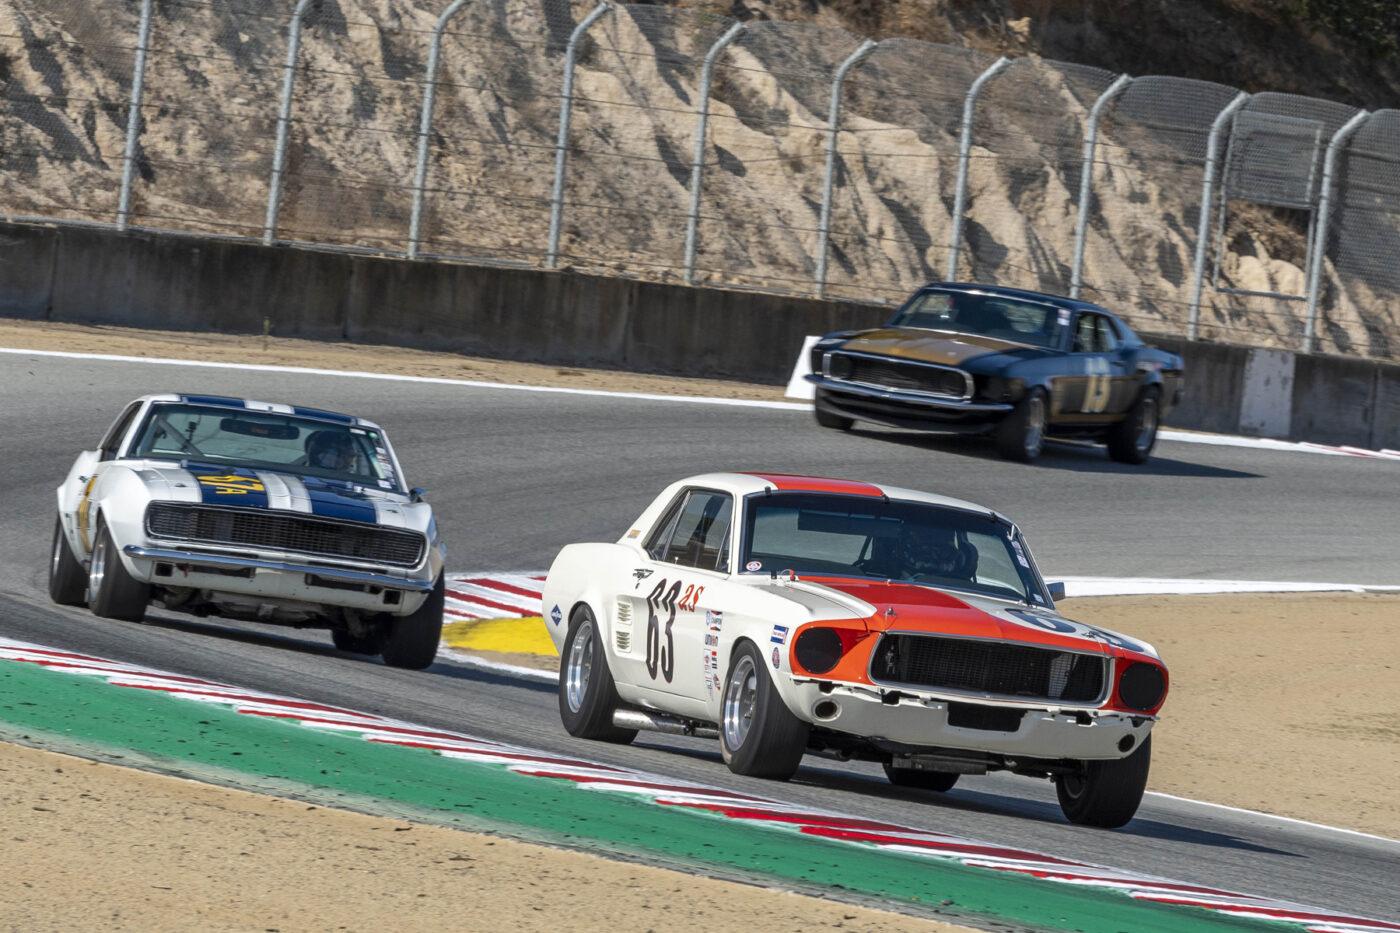 Group 5: 1966-1972 Trans-Am - Peter Klutt - 1967 Ford Shelby Notchback Race Car - ©Rex McAfee